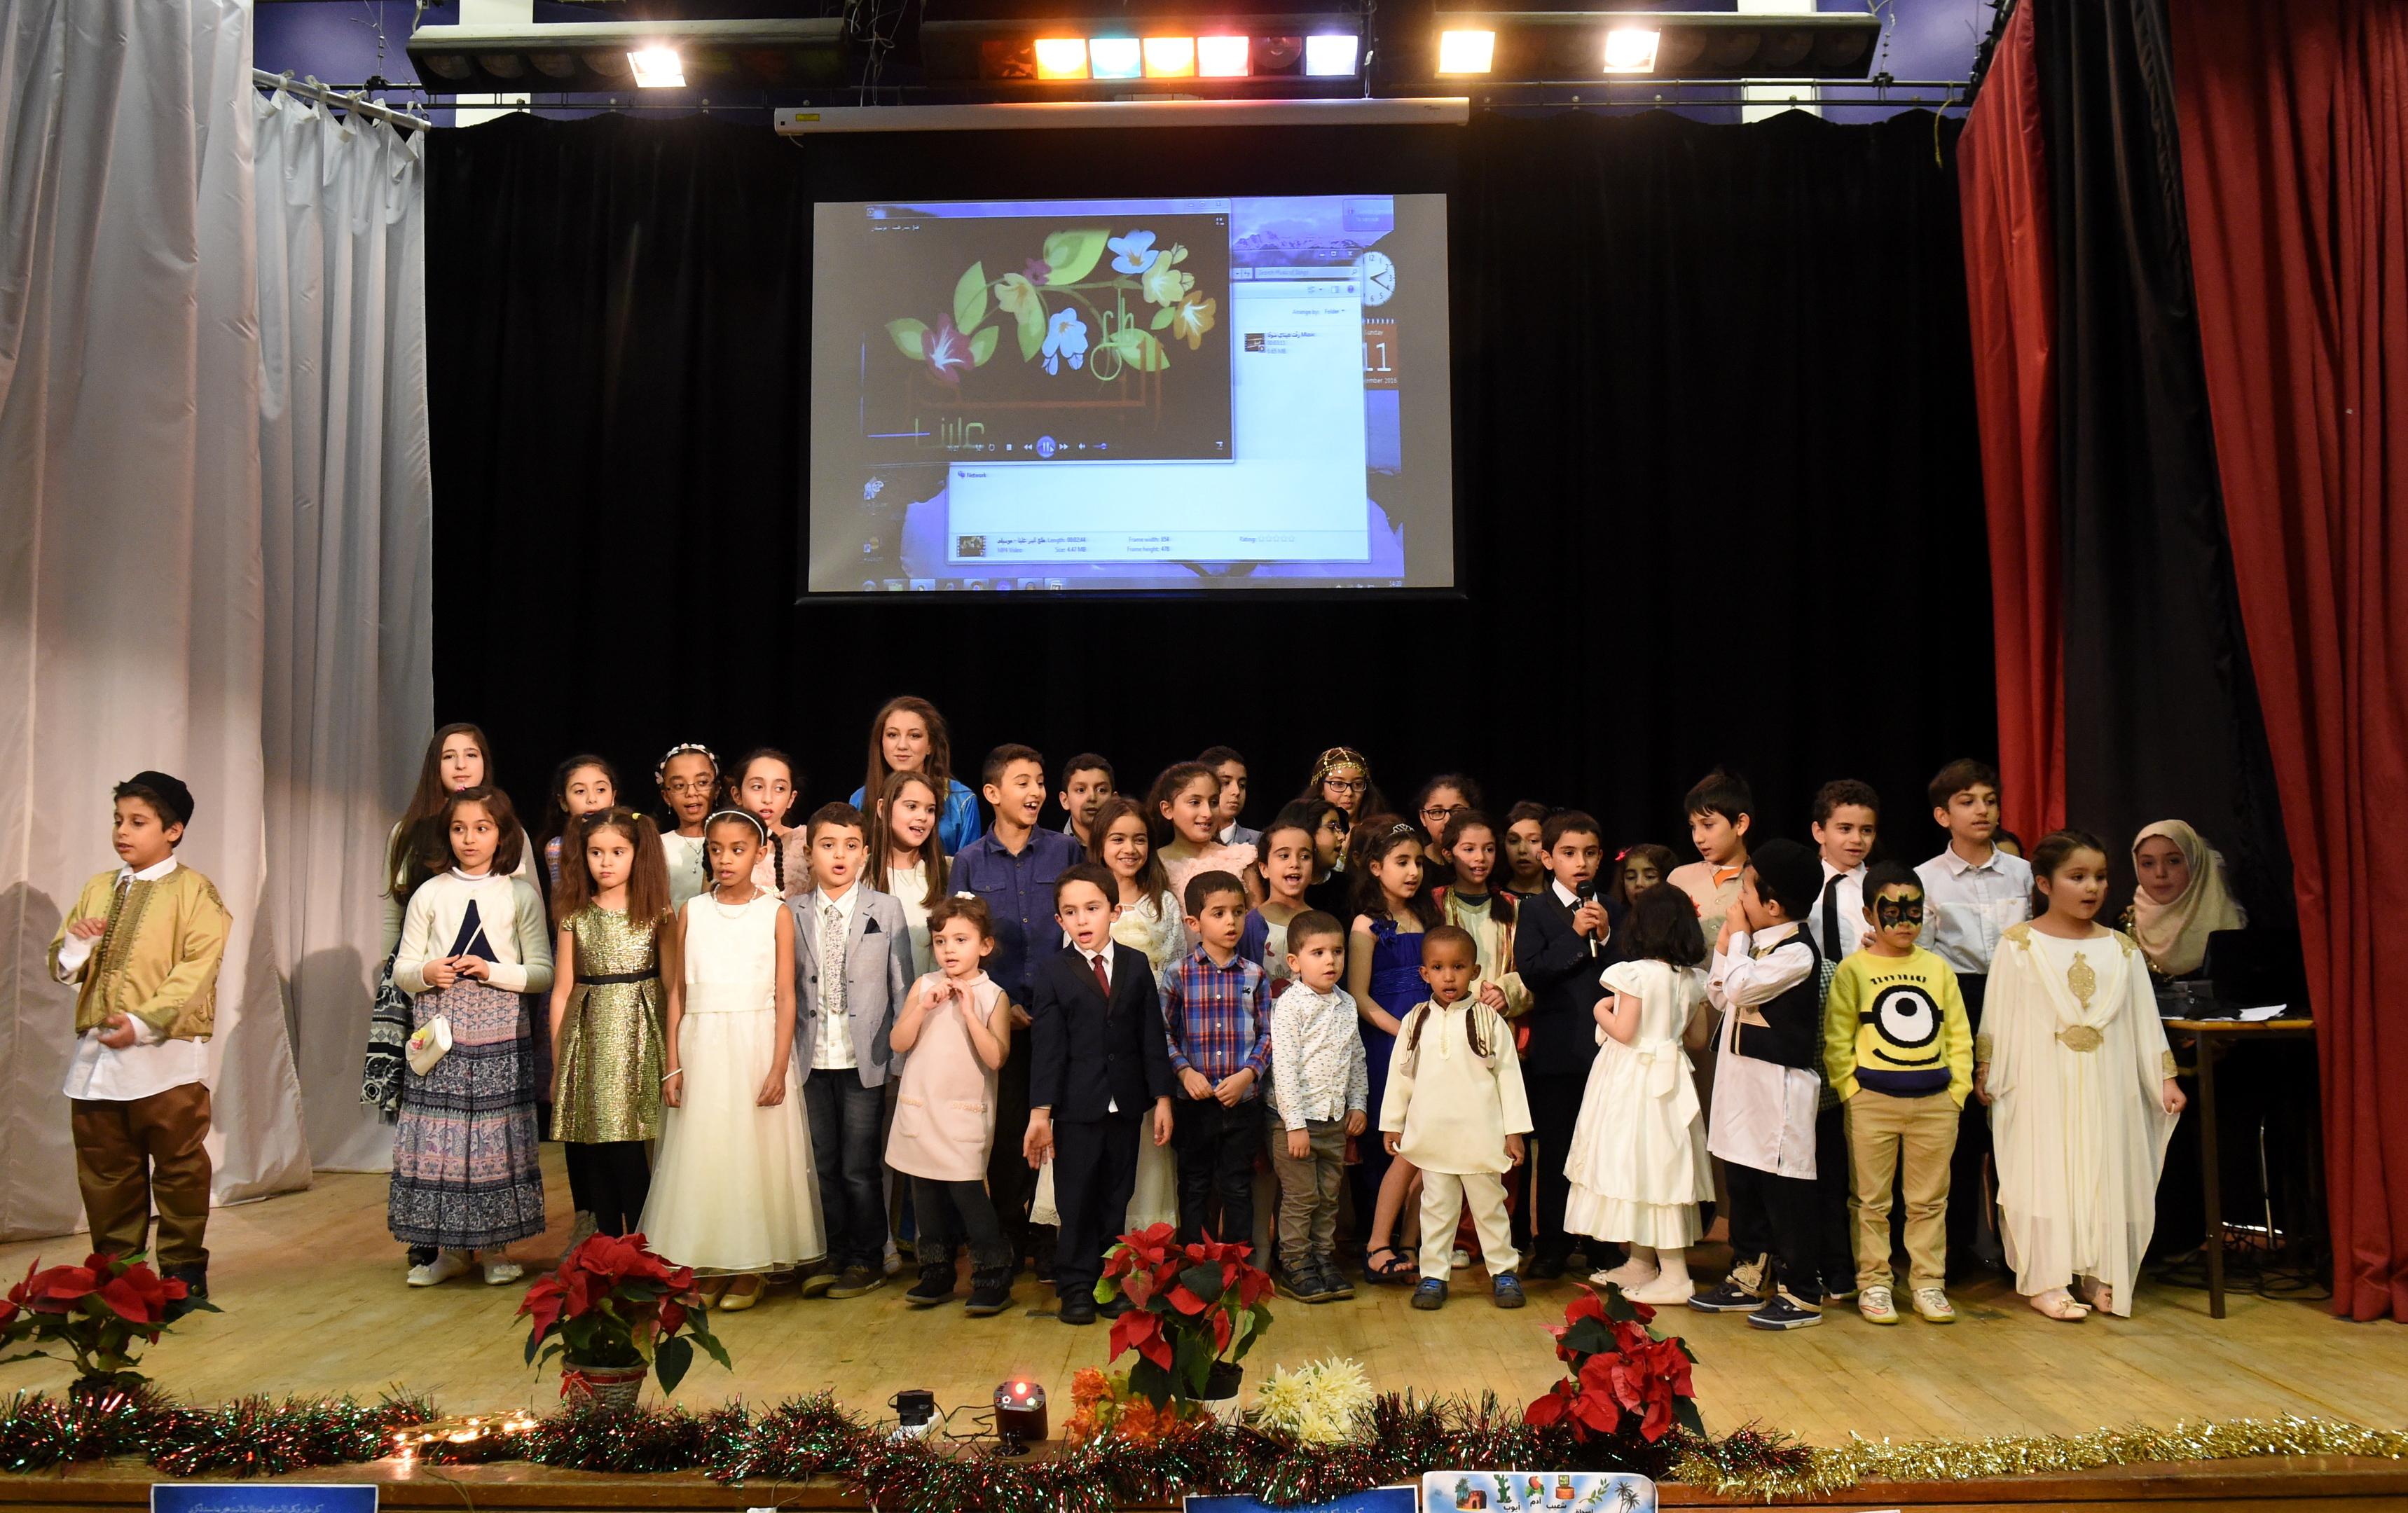 Children  involved in the  celebration at the Smithfield Road centre.